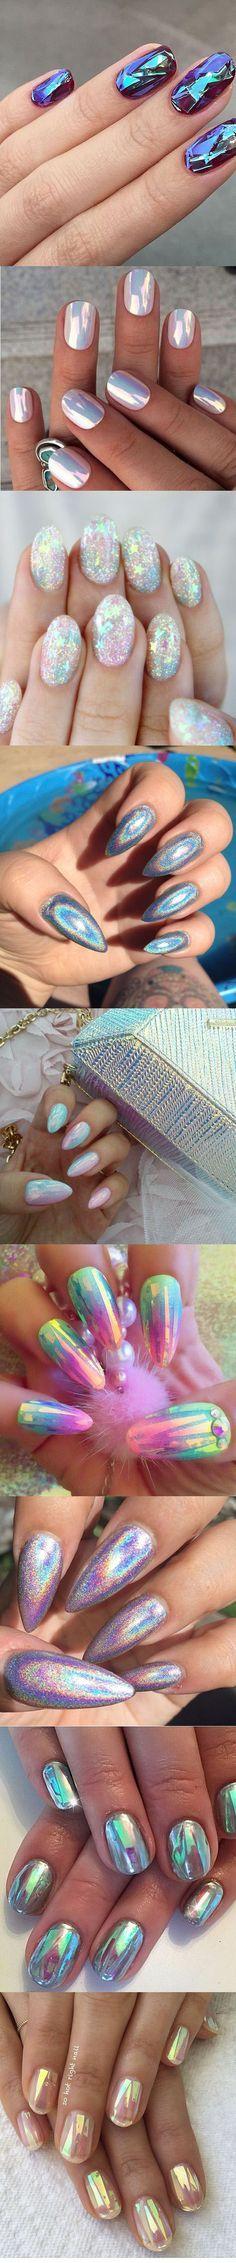 Holographic mermaid nails #manicure | http://ko-te.com by /evatornado/ |